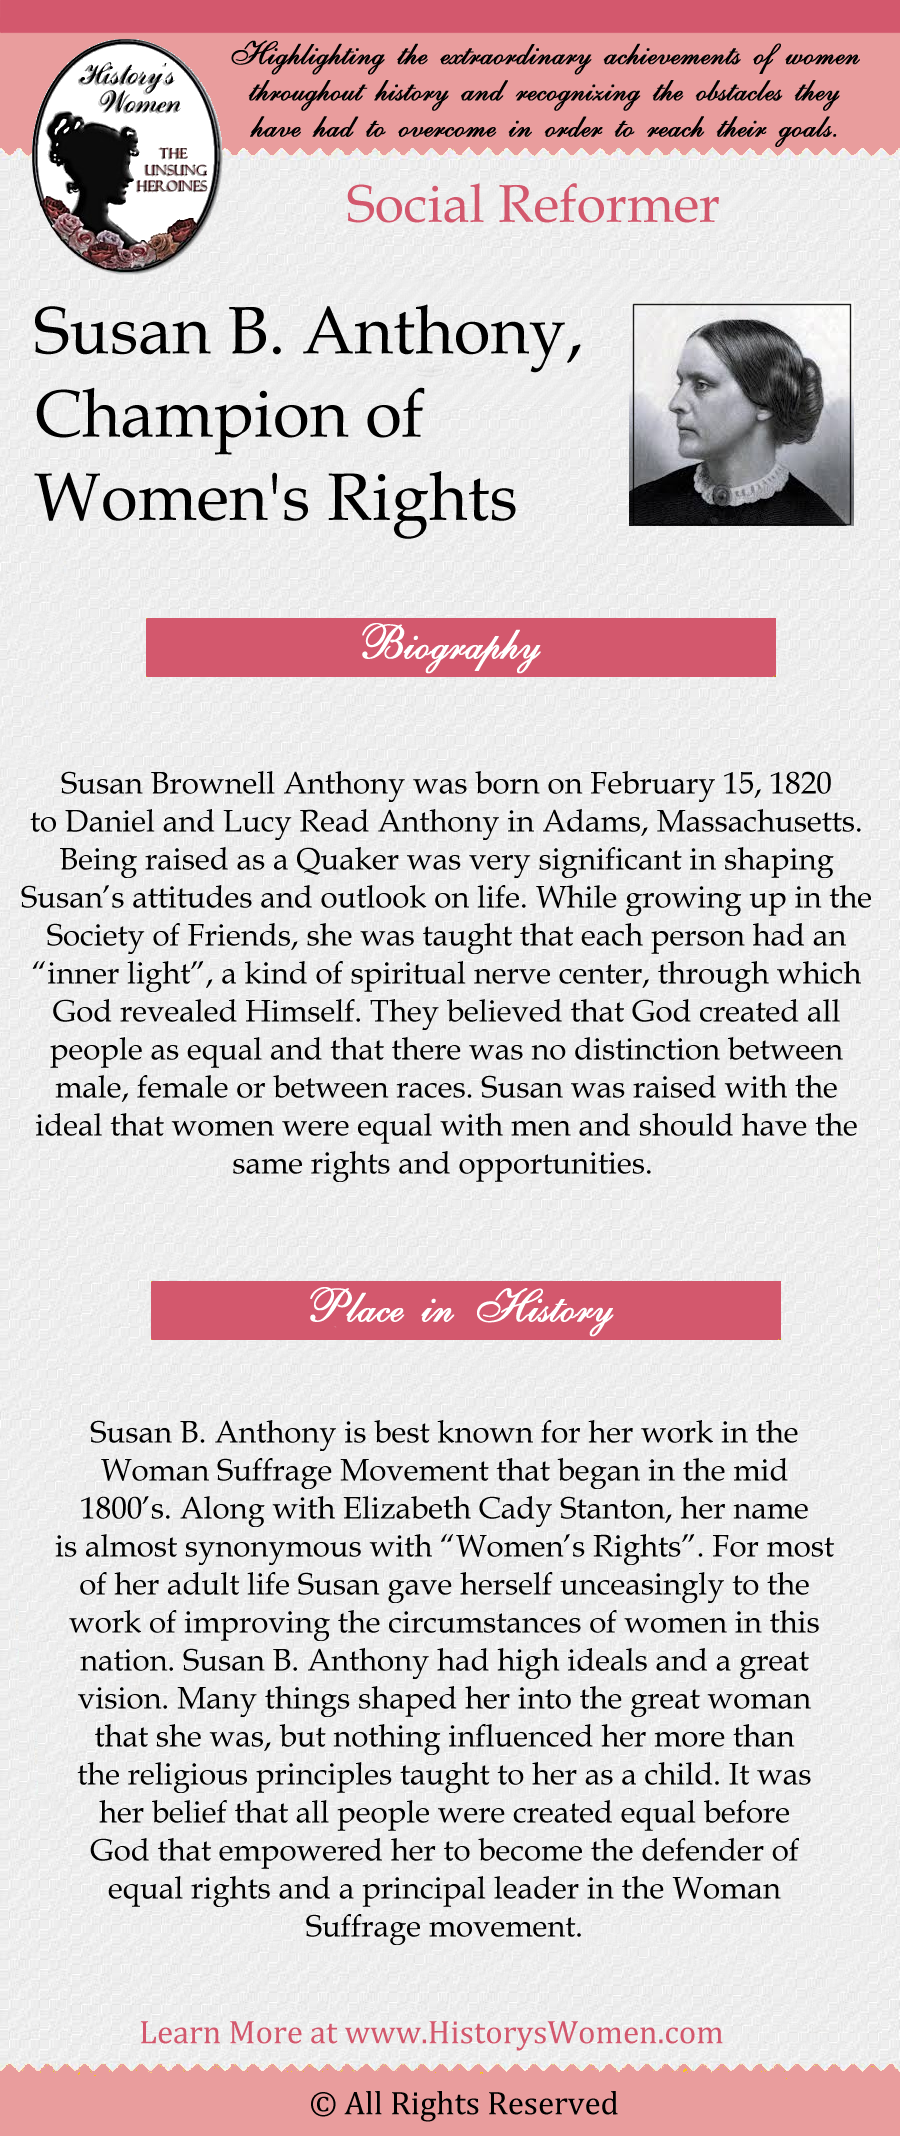 SusanBAnthony